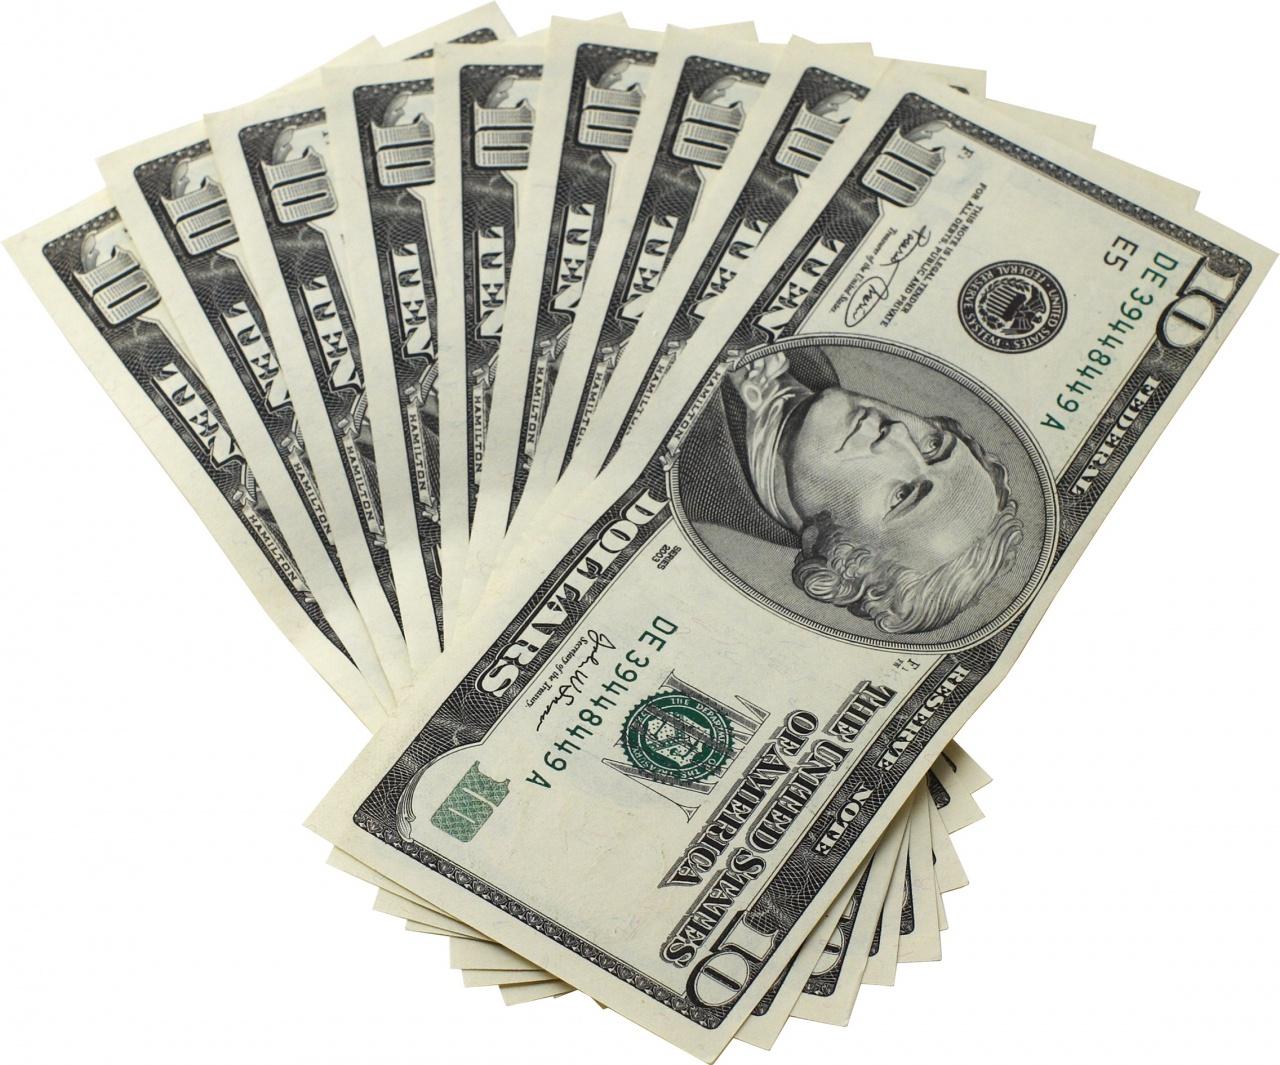 Курс доллара на май 2019 года: прогноз рекомендации